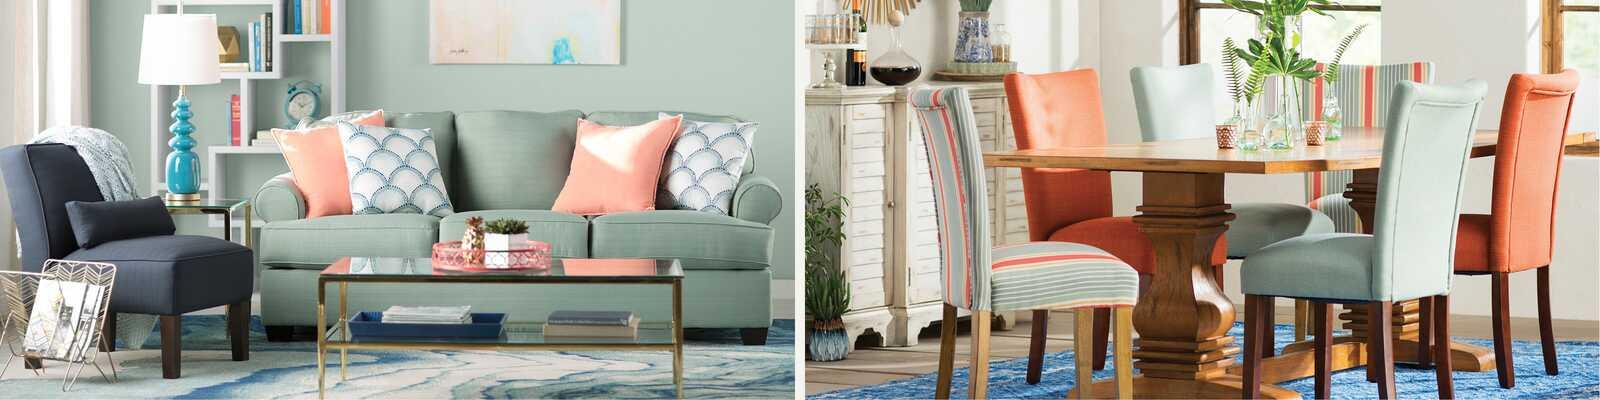 background_image & Wayfair.com - Online Home Store for Furniture Decor Outdoors \u0026 More